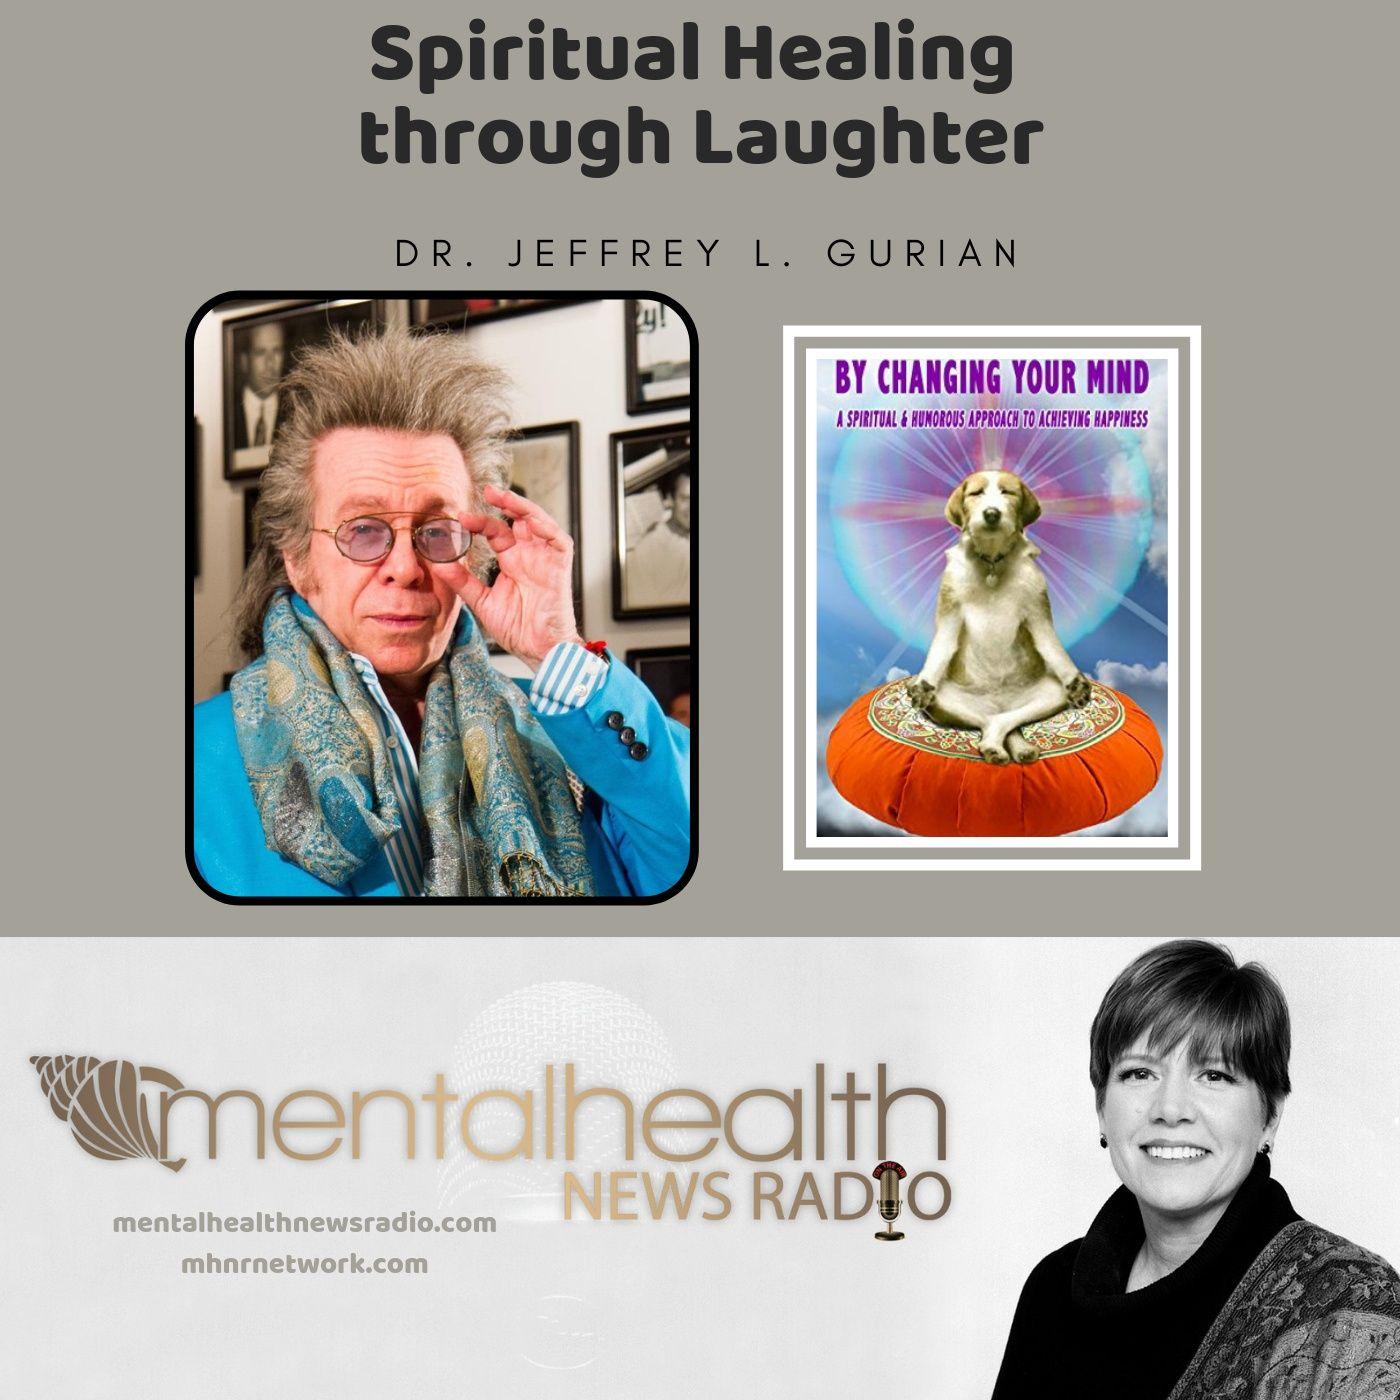 Mental Health News Radio - Spiritual Healing through Laughter with Dr. Jeffrey Gurian